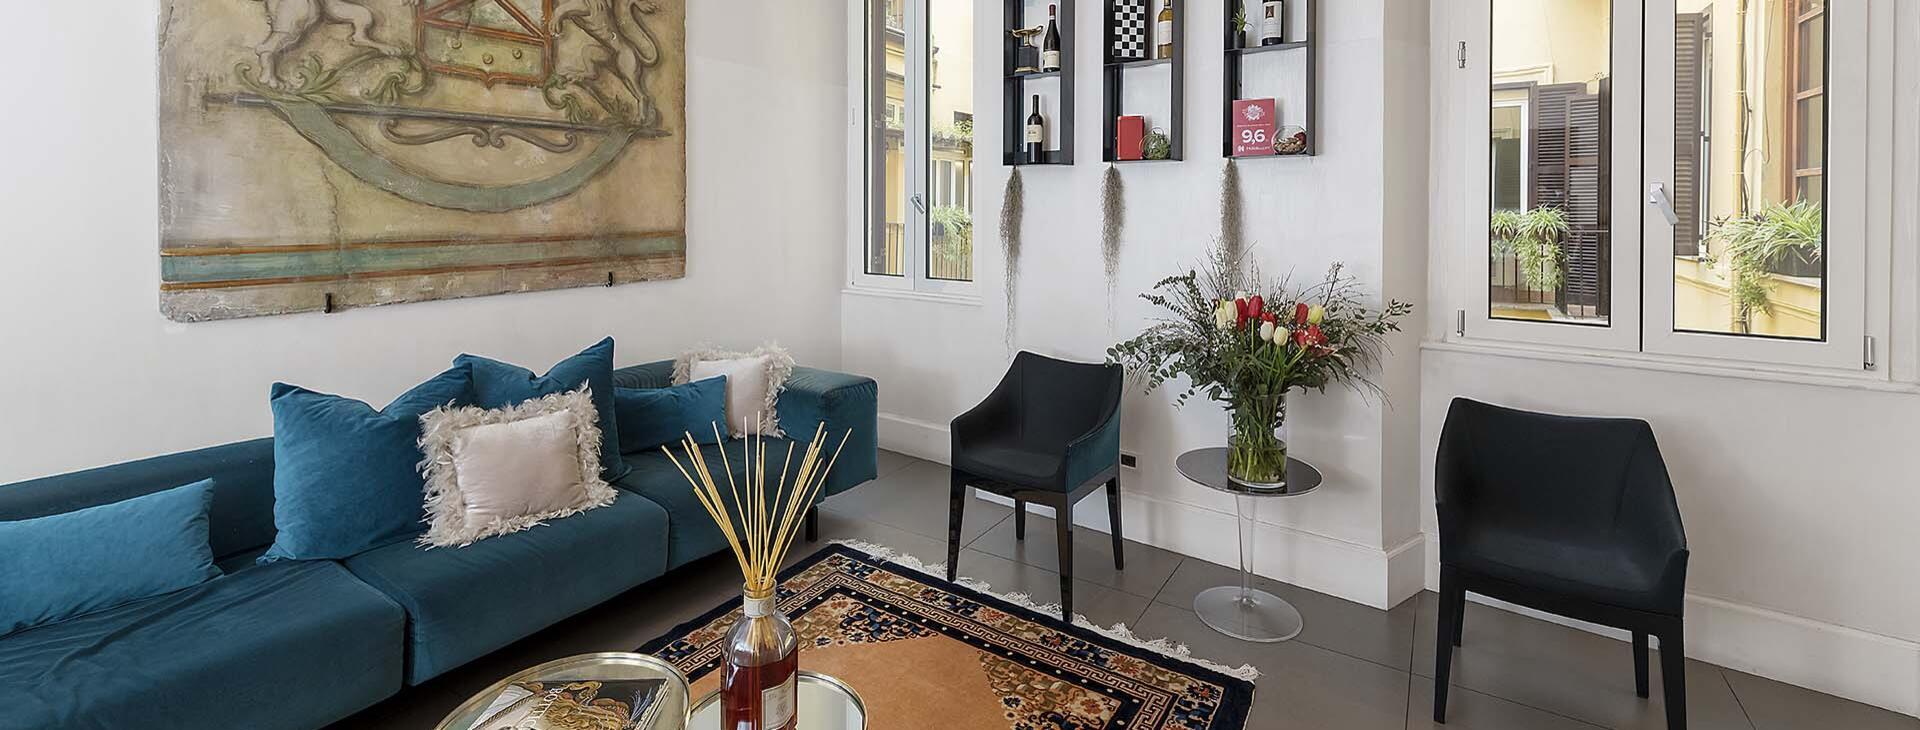 argentinastylehotel en argentina-style-hotel-rome-photo-gallery 001